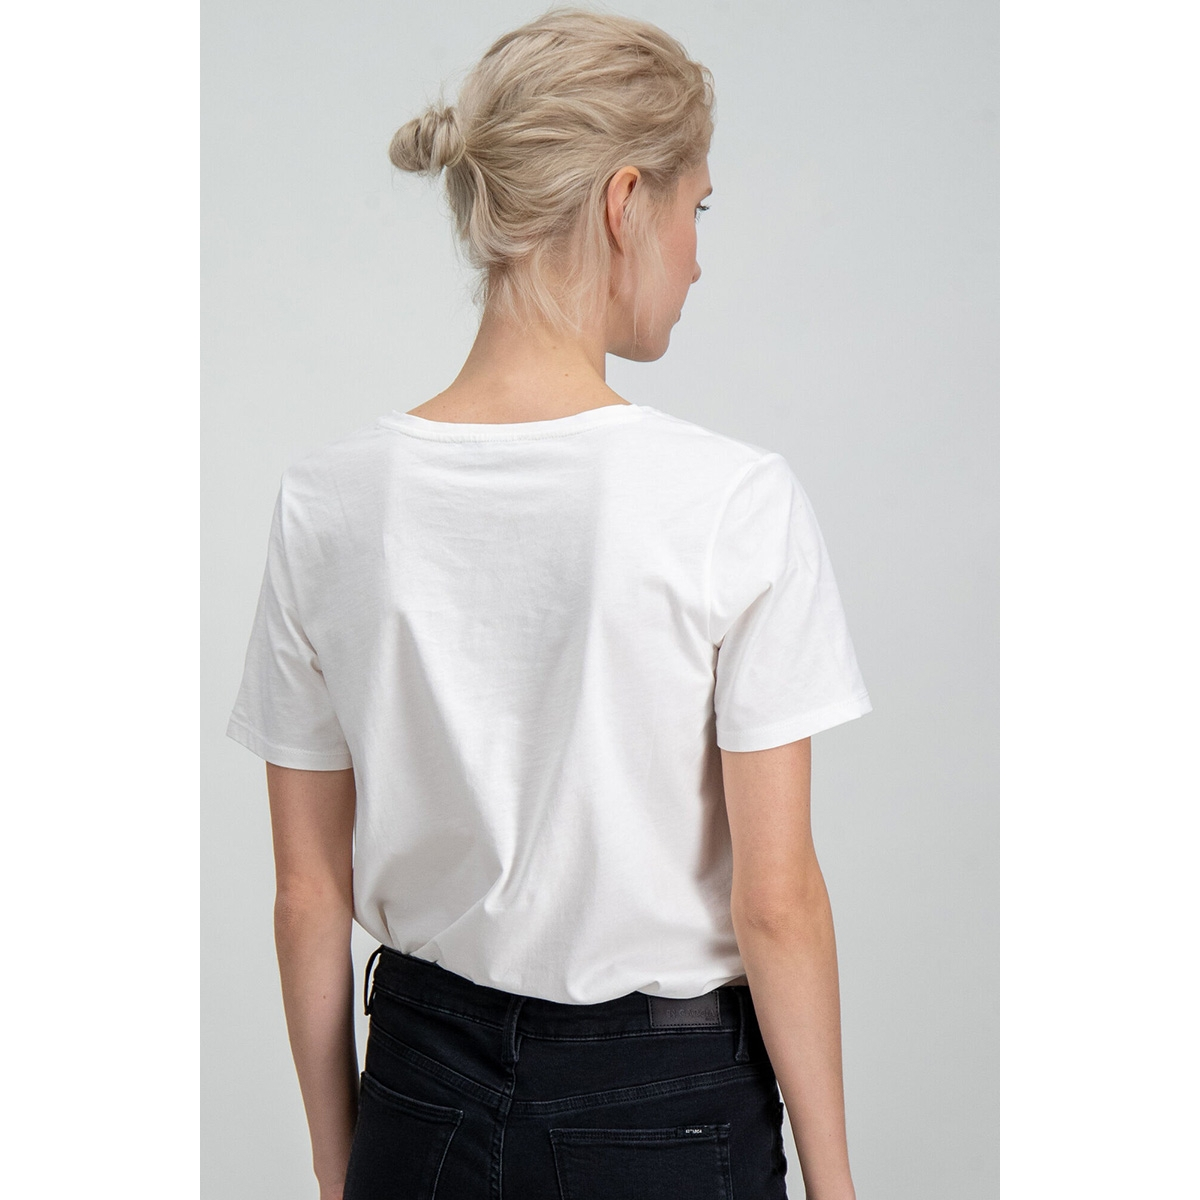 t shirt met opdruk i90003 garcia t-shirt 53 off white